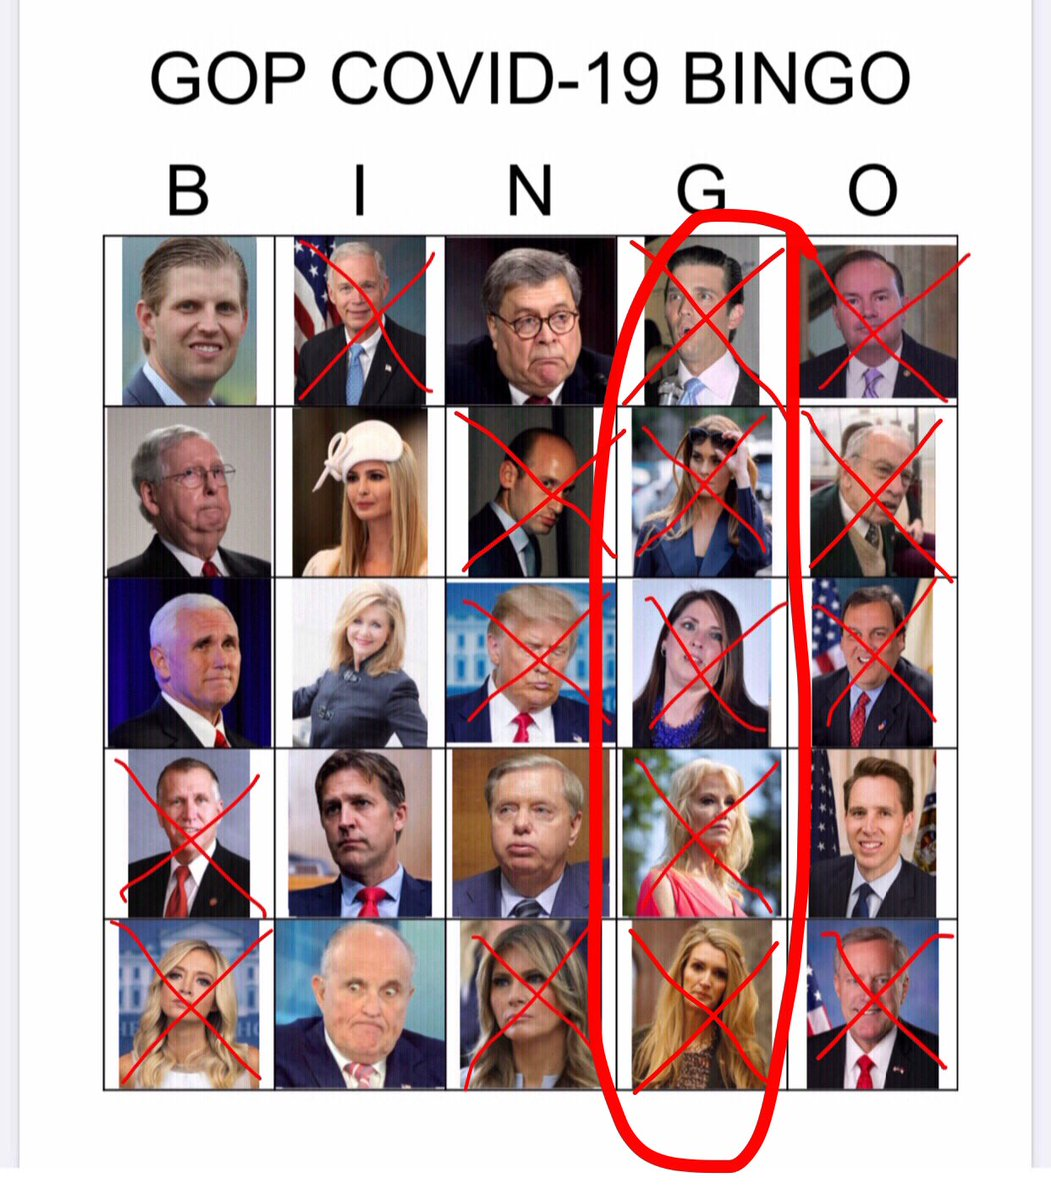 @nytimes My winning bingo card https://t.co/qw38FlK4iC